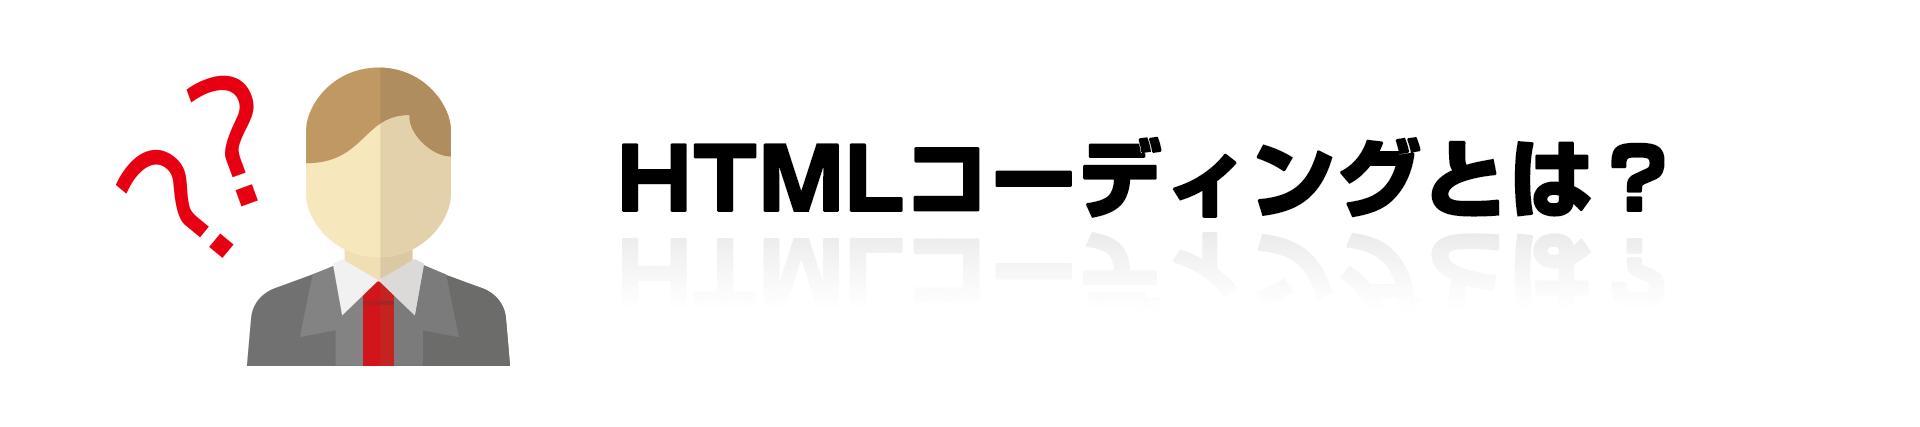 HTMLコーディングとは画像